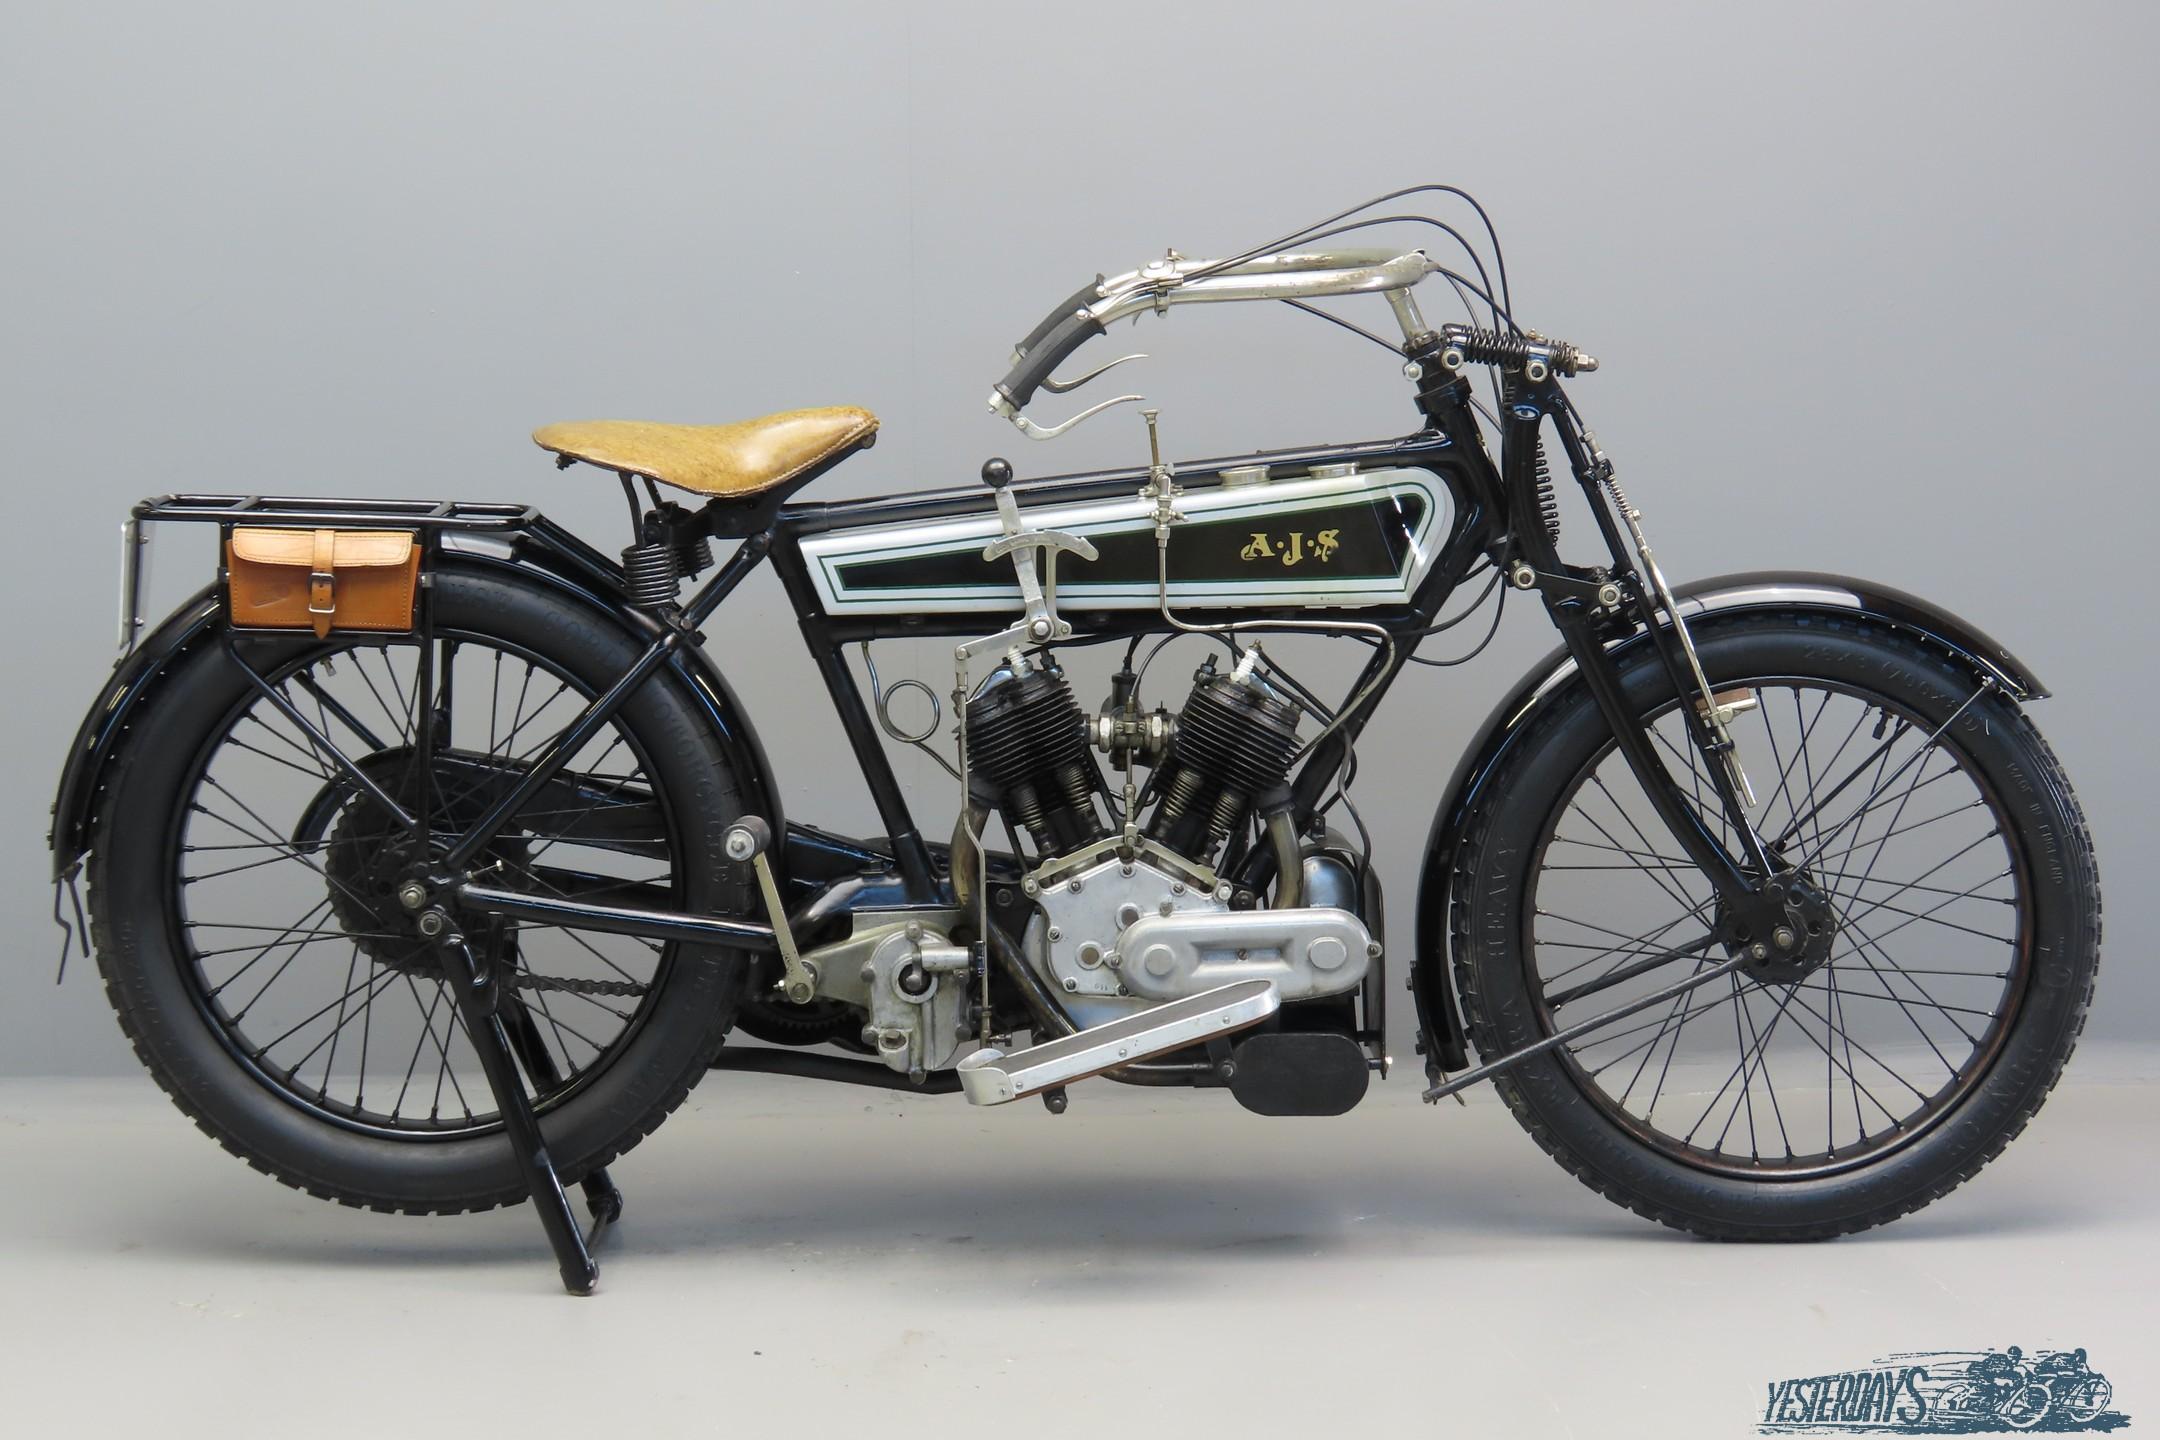 Ajs 1916 Model A 550cc 2 cyl sv  3007